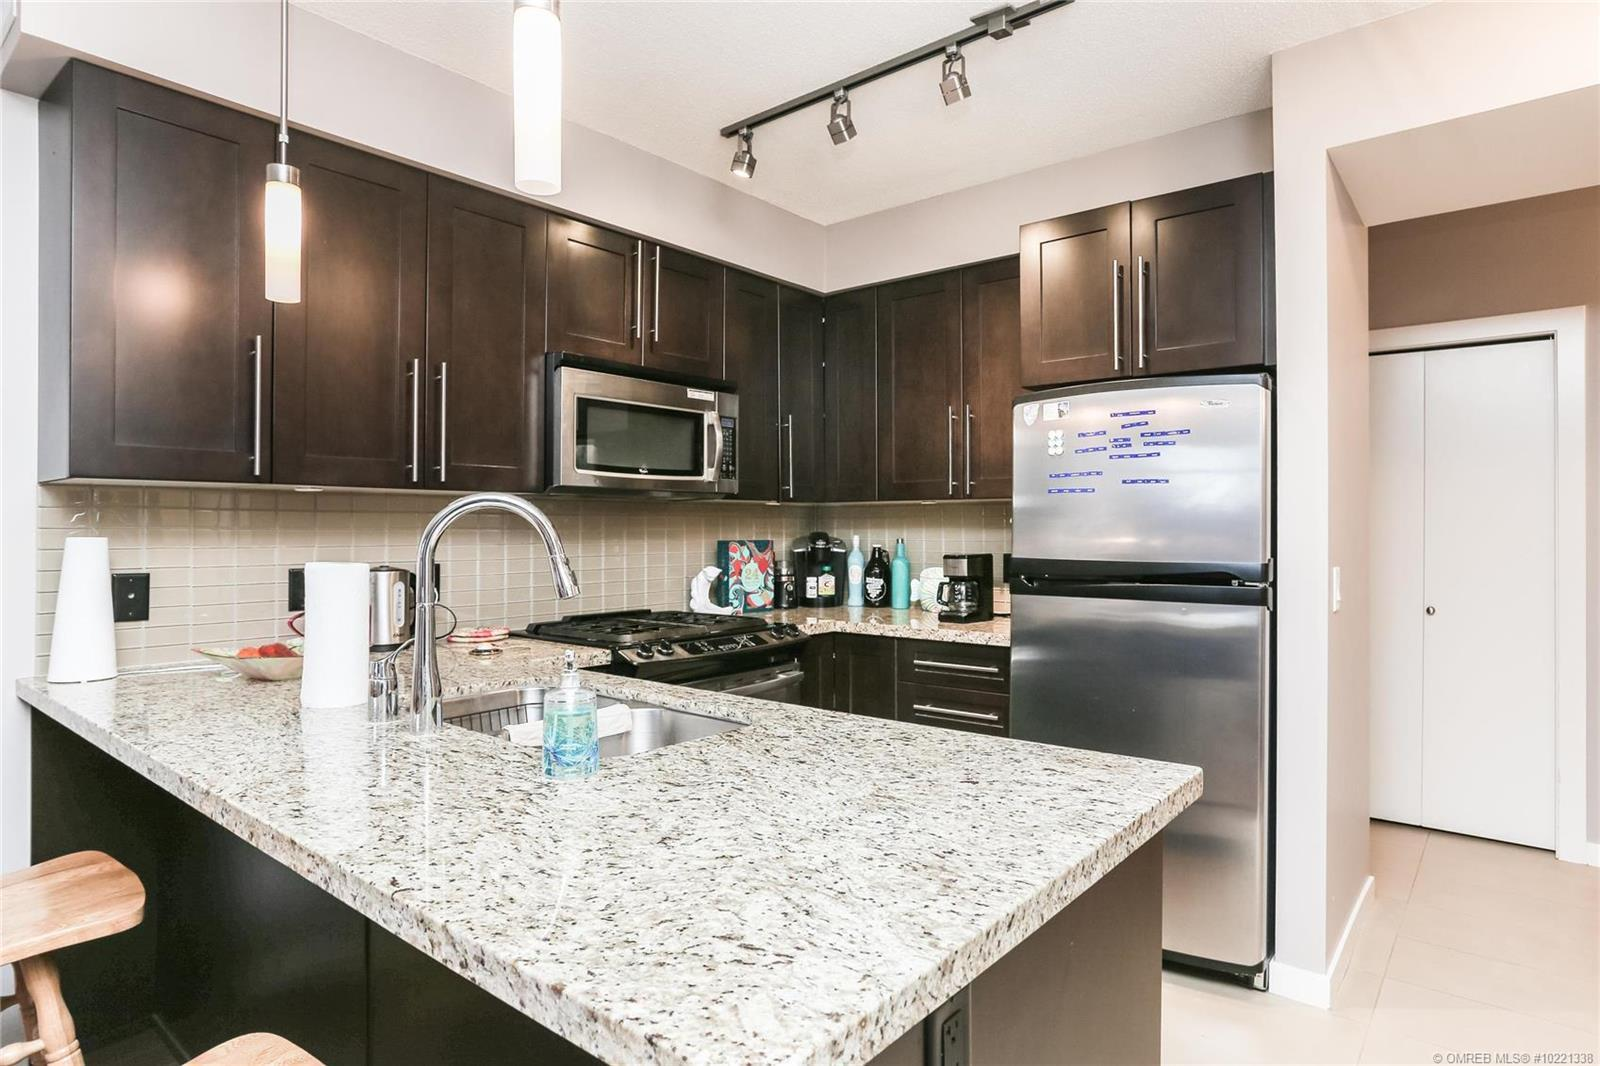 #404 1075 Sunset Drive, - Kelowna Apartment for sale, 1 Bedroom (10221338) - #5